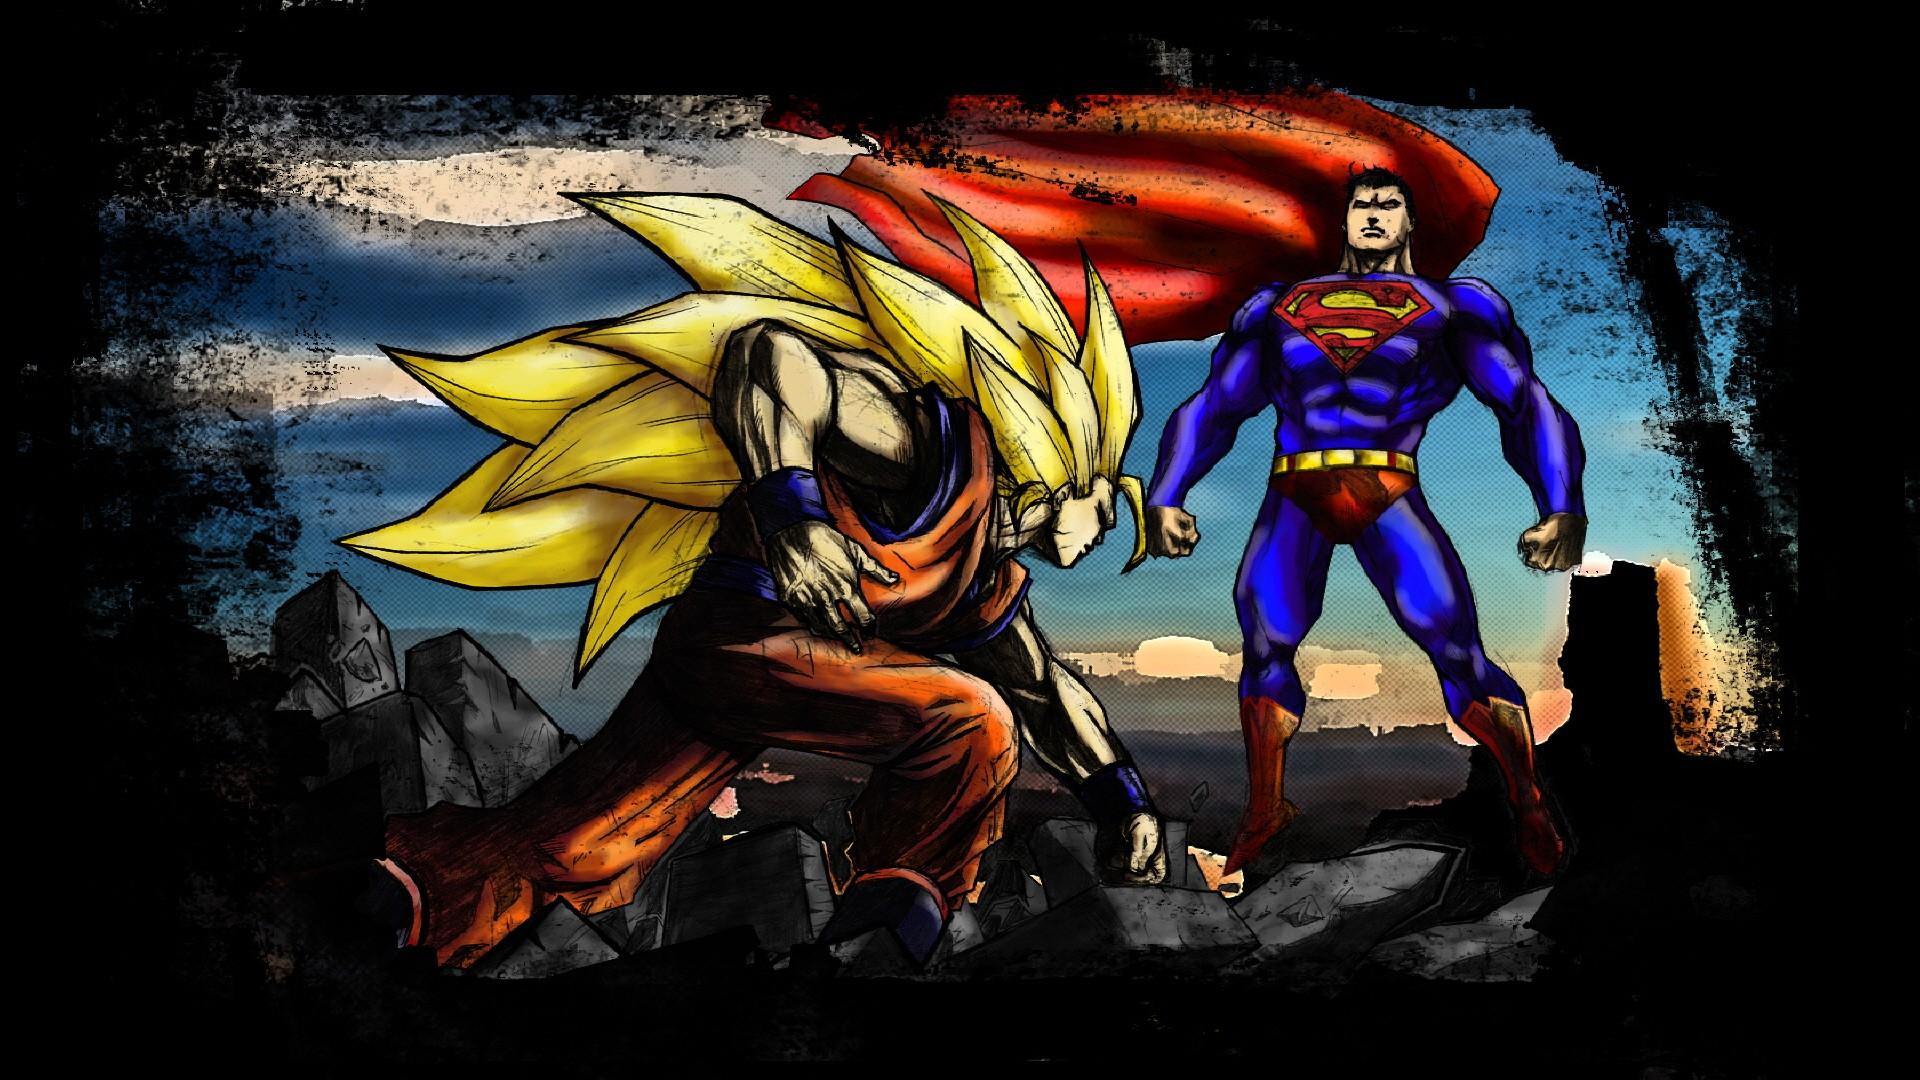 Illustration Superhero Dragon Ball Son Goku Comics Superman Super Saiyan Screenshot Computer Wallpaper Fictional Character Comic